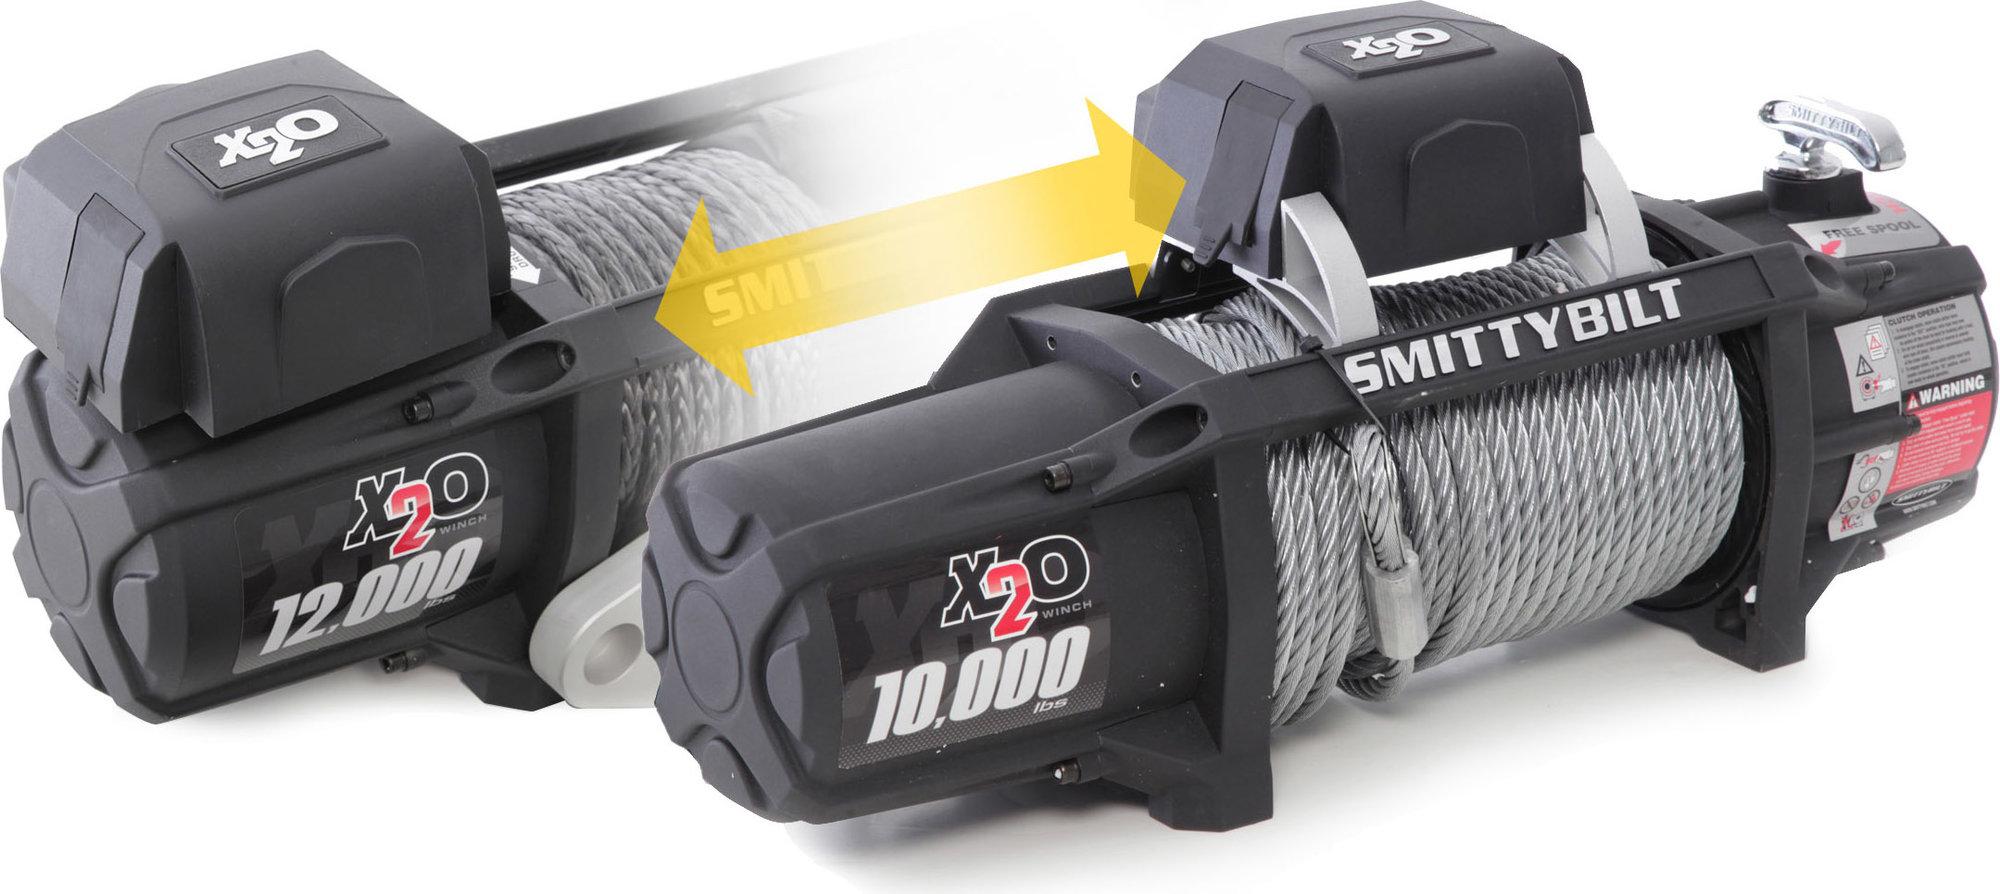 hight resolution of smittybilt x20 winch wiring diagram